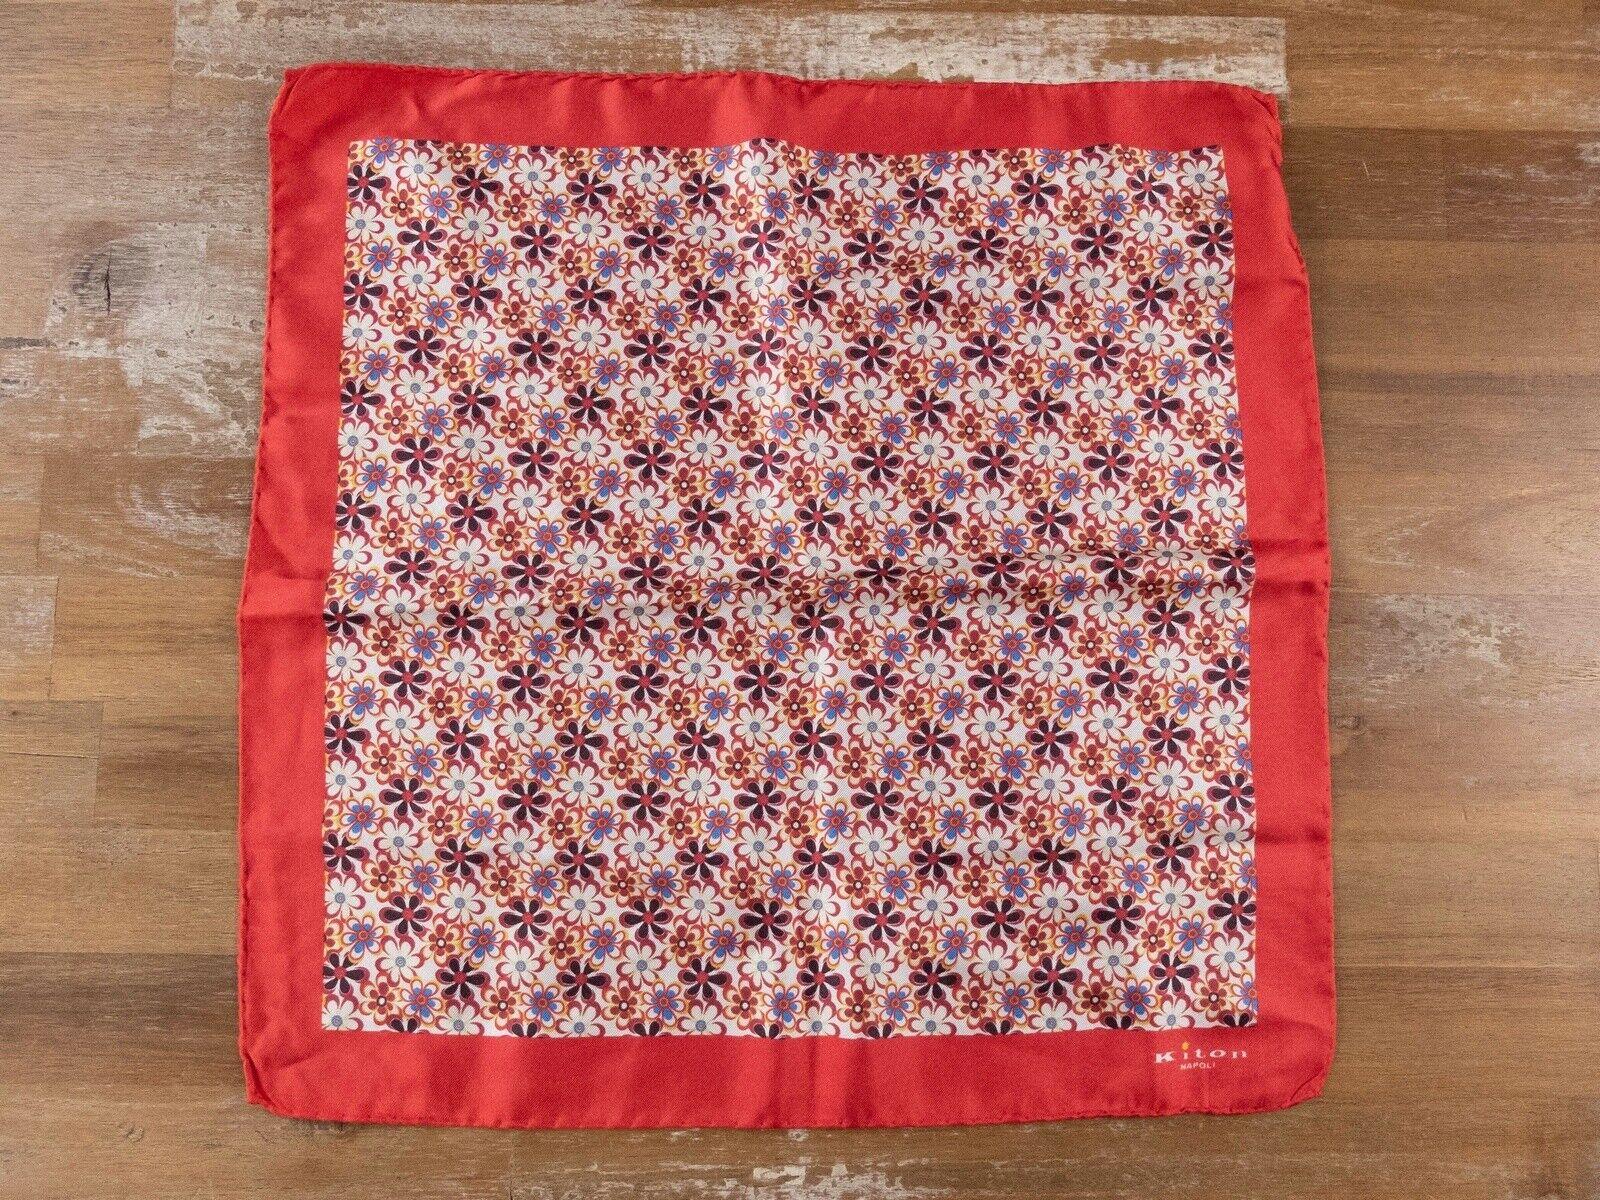 KITON Napoli red floral motif silk pocket square authentic - NWT